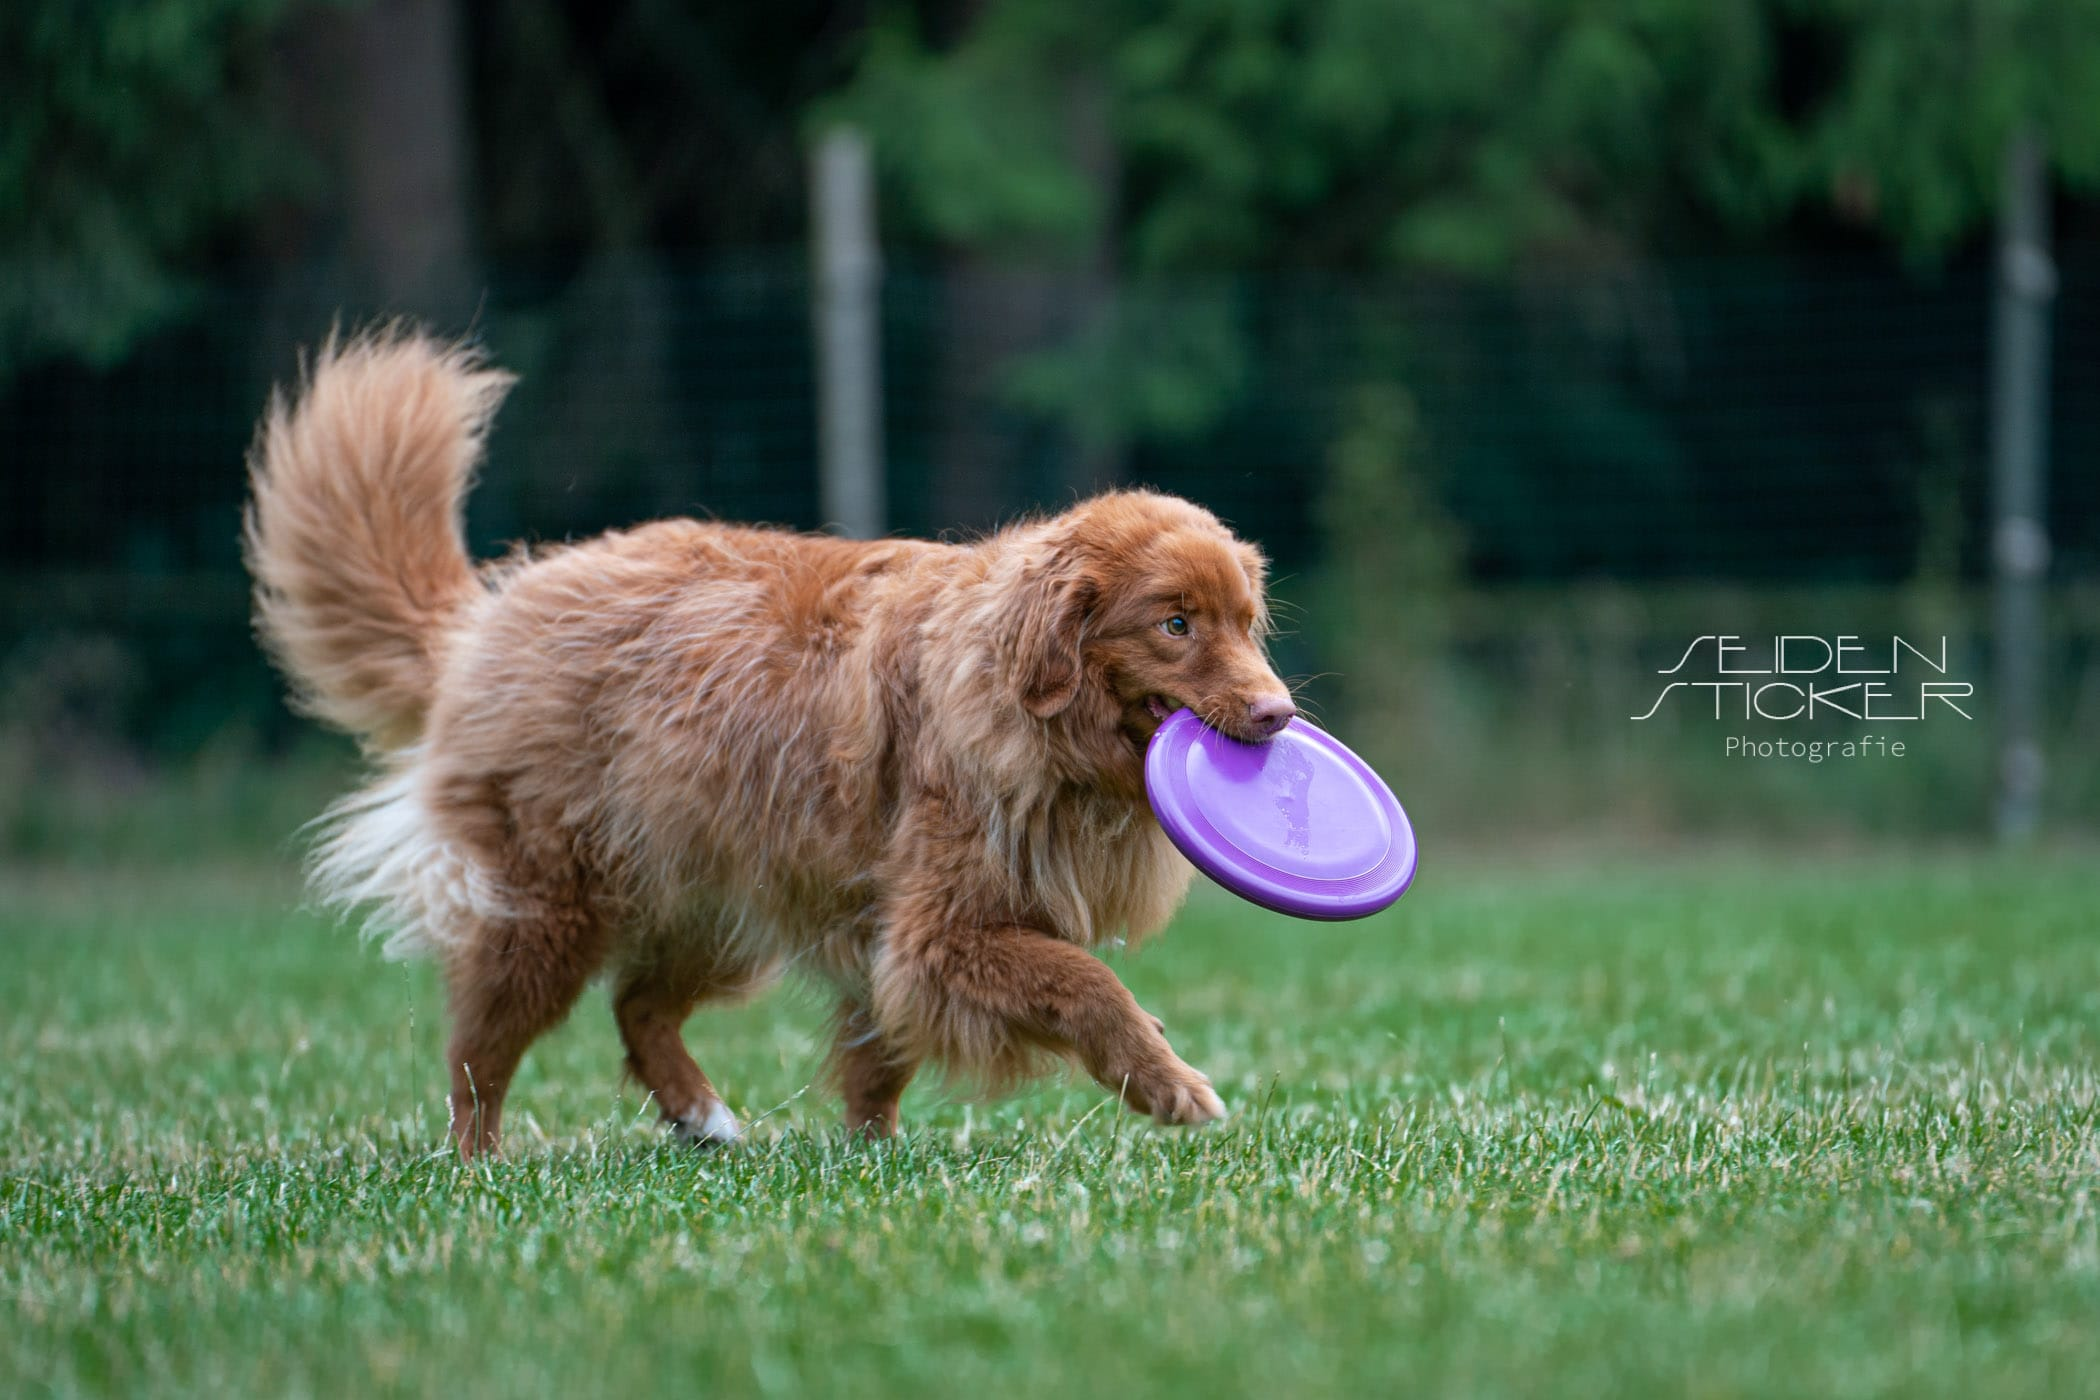 Seidensticker Frisbee Juli 2021 136